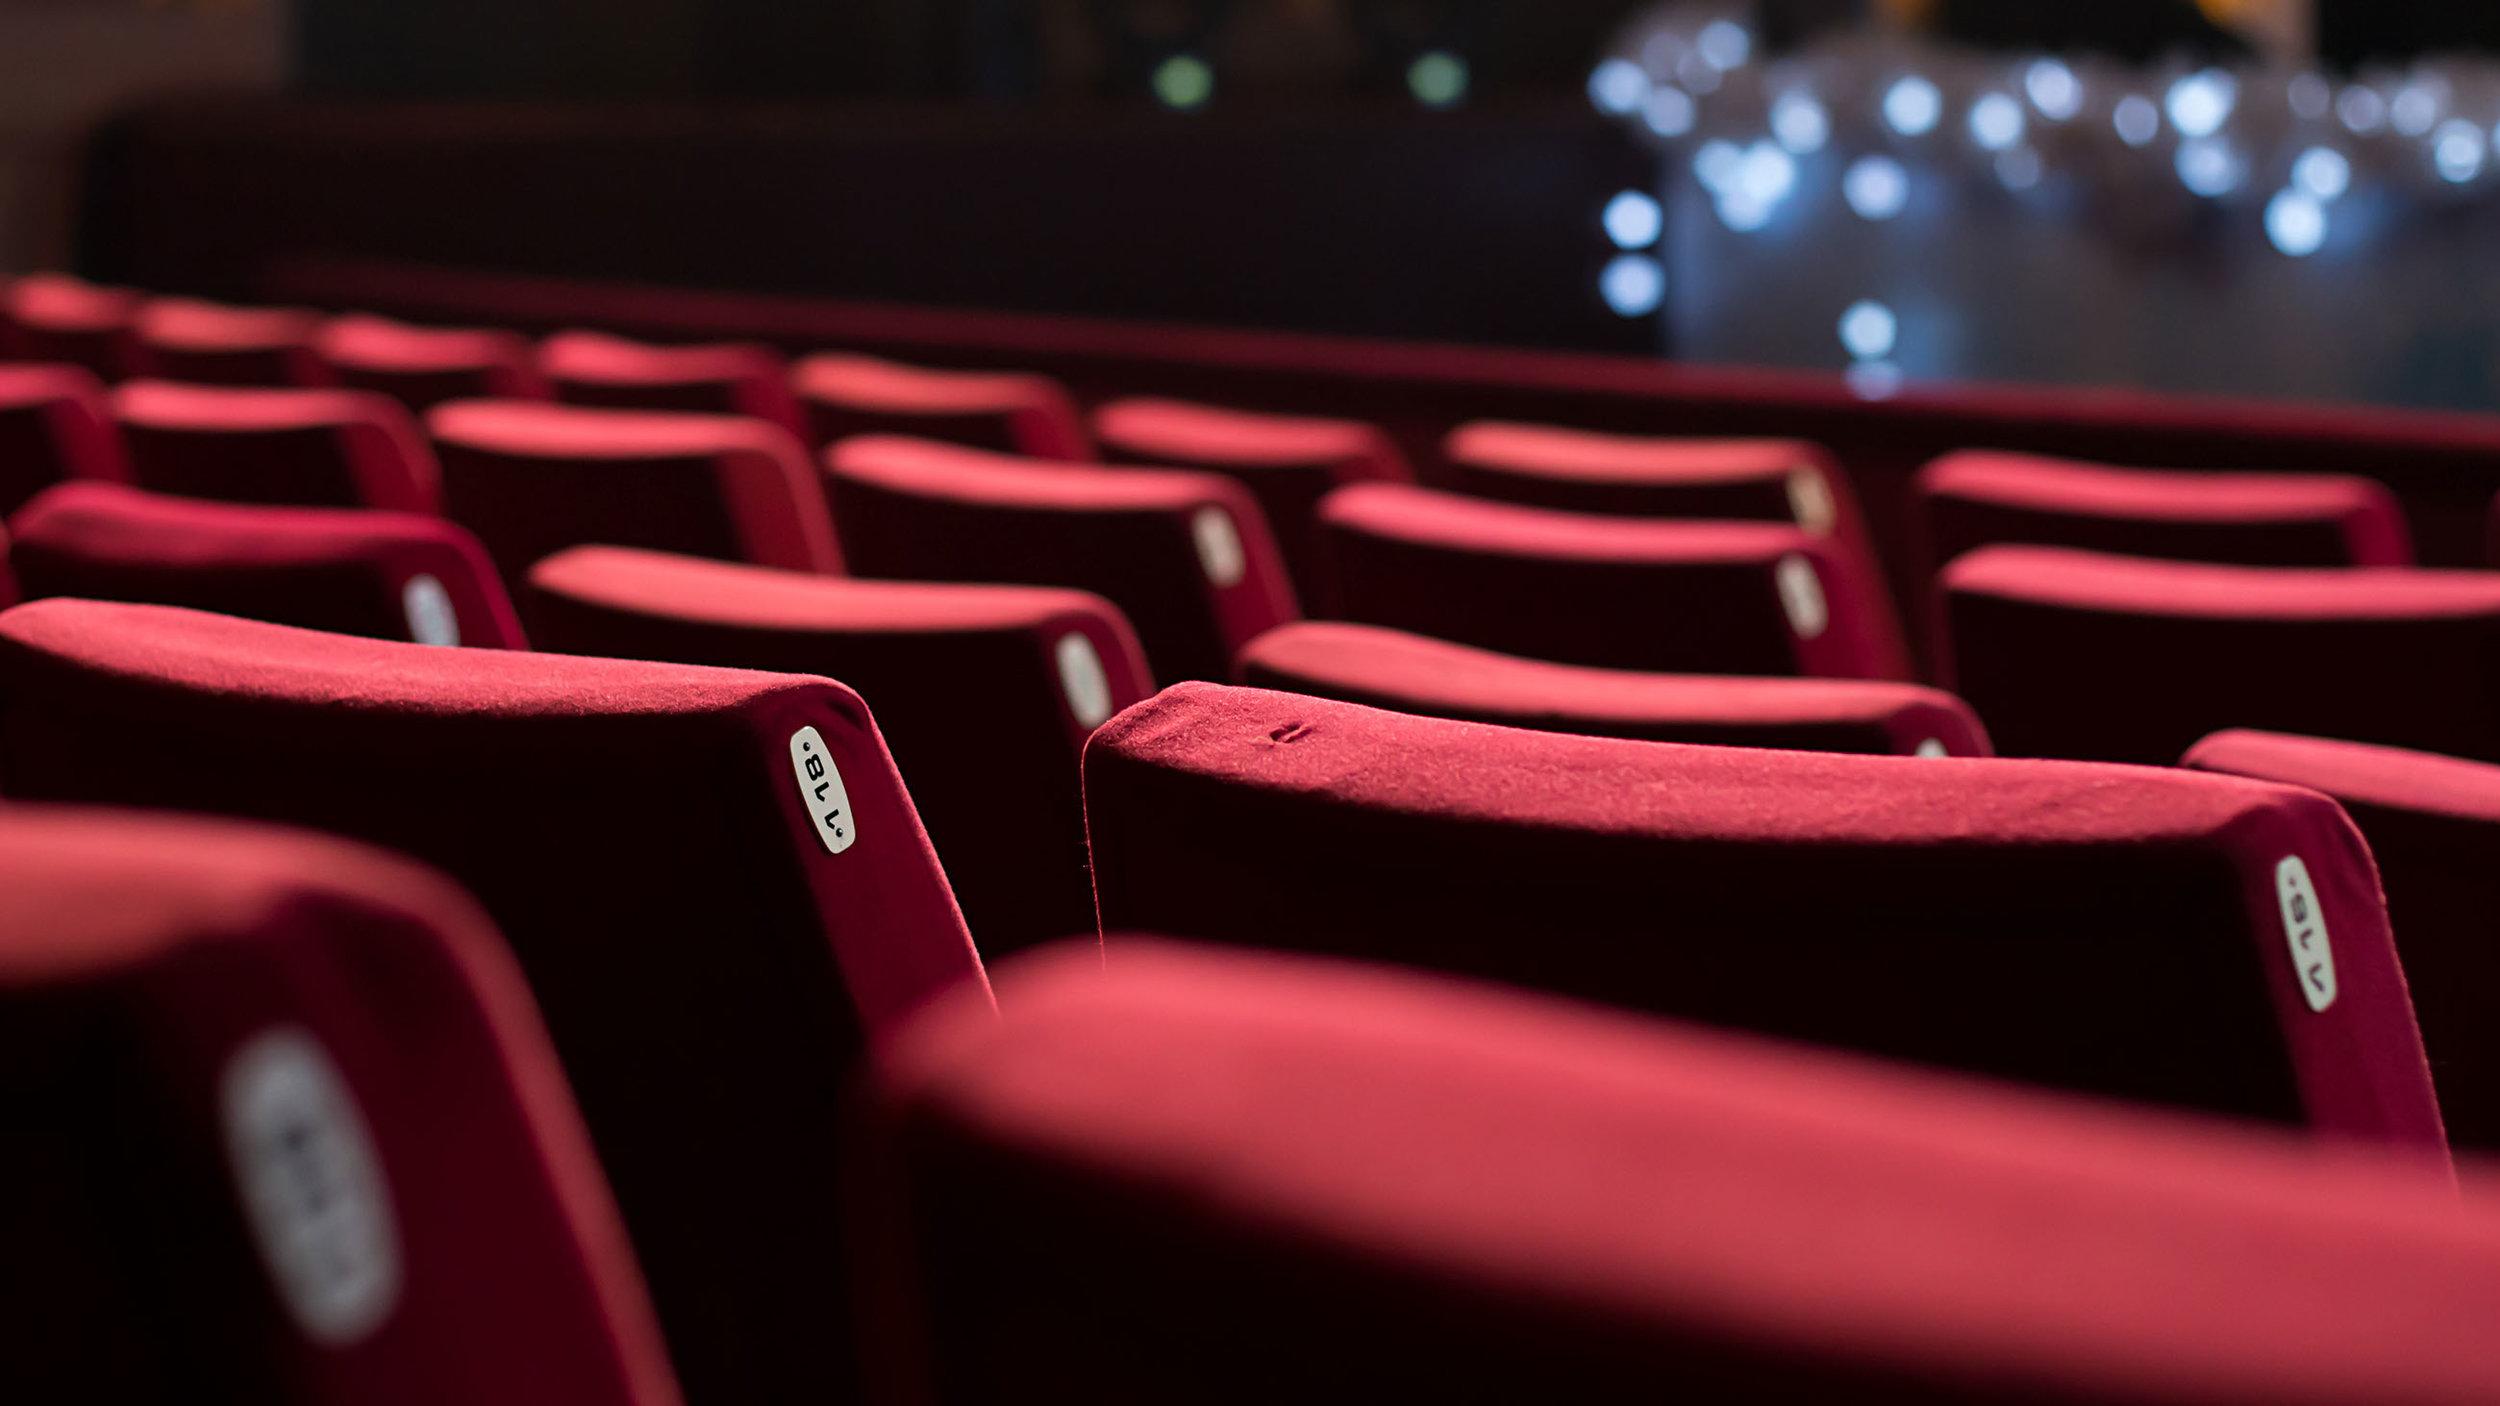 theatre-seats.jpg